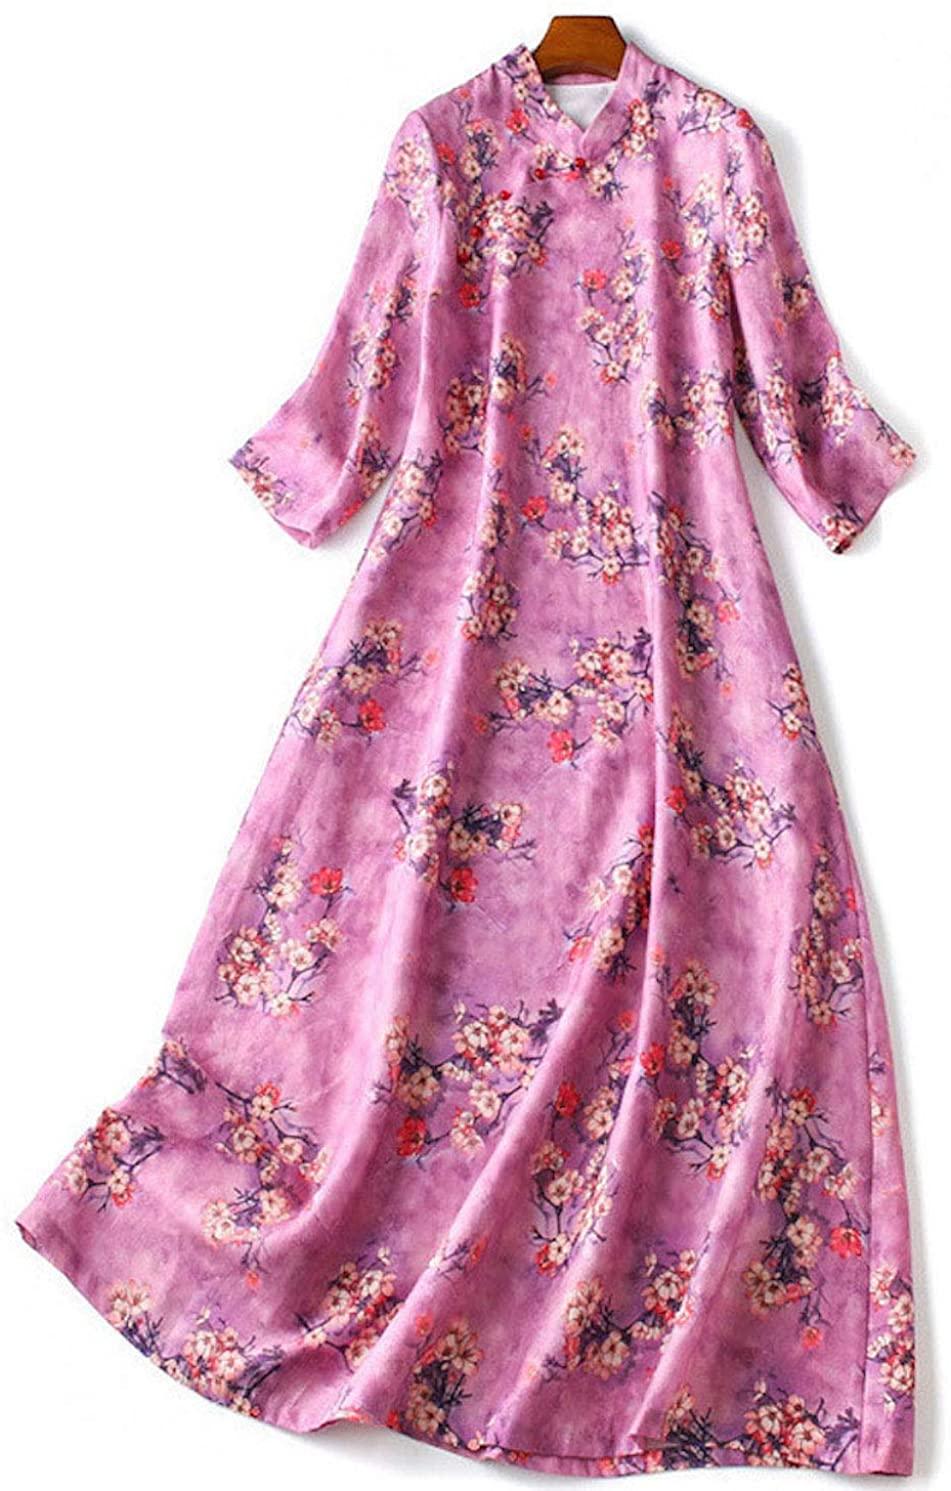 HangErFeng Dress Ramie Printed Modified Cheongsam Slim Chinese Style Elegant Romantic A-Line Skirt